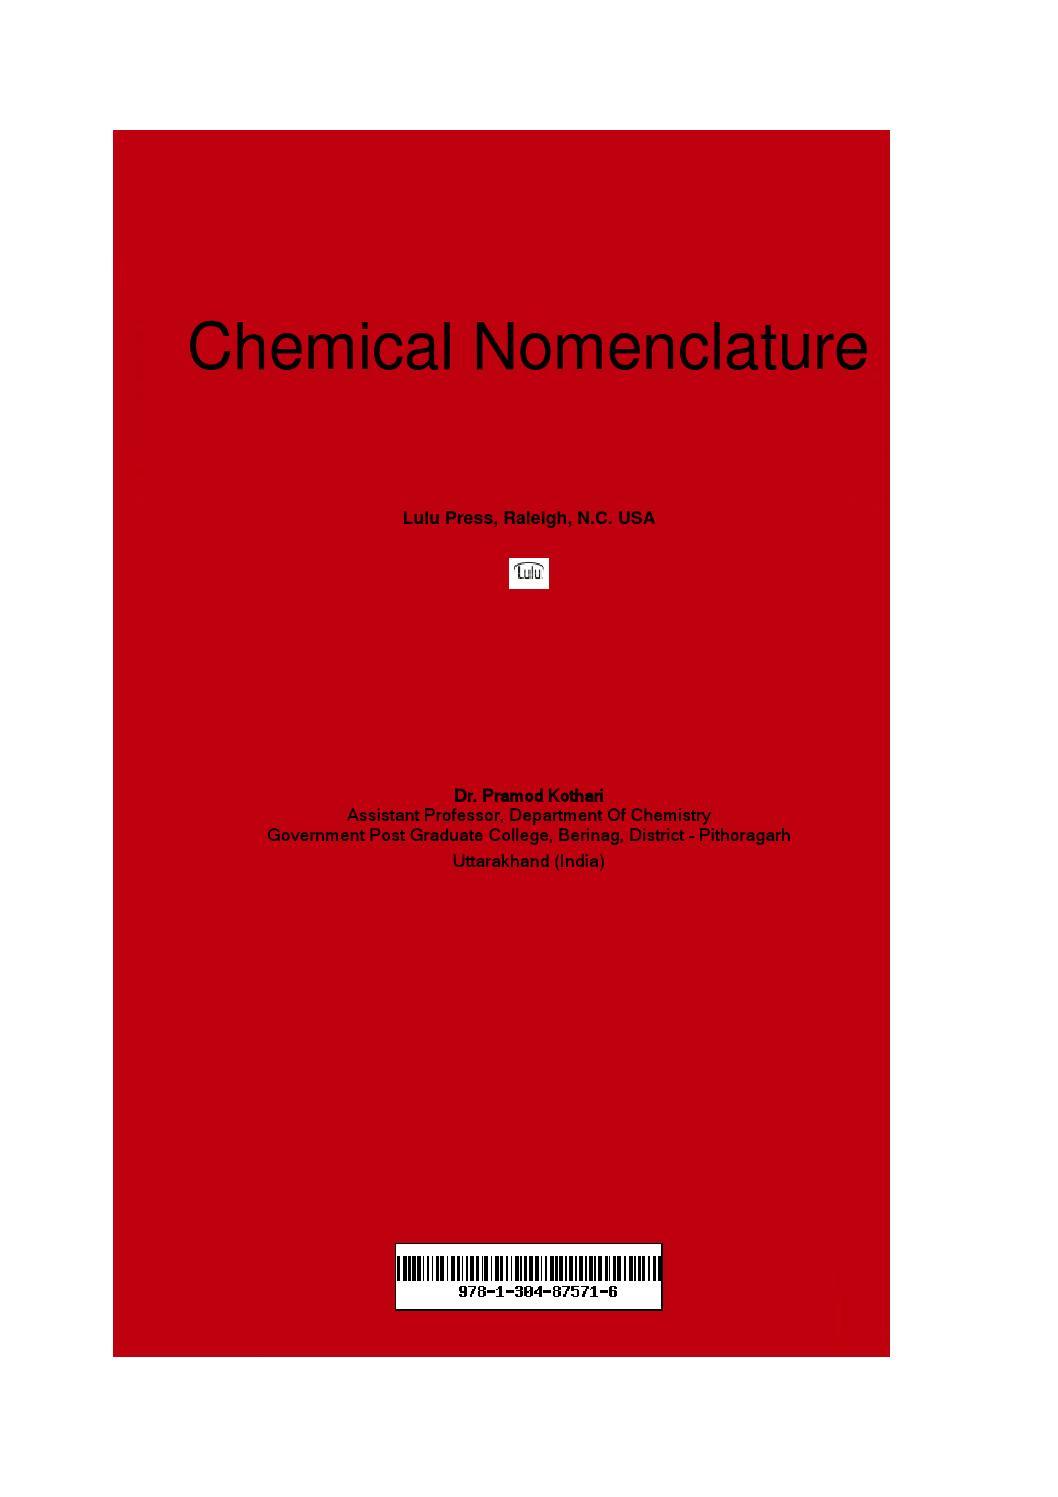 Chemical Nomenclature By Pramod Kothari Issuu Structure Of A Bacterium Image Marianaruiz Villarreal